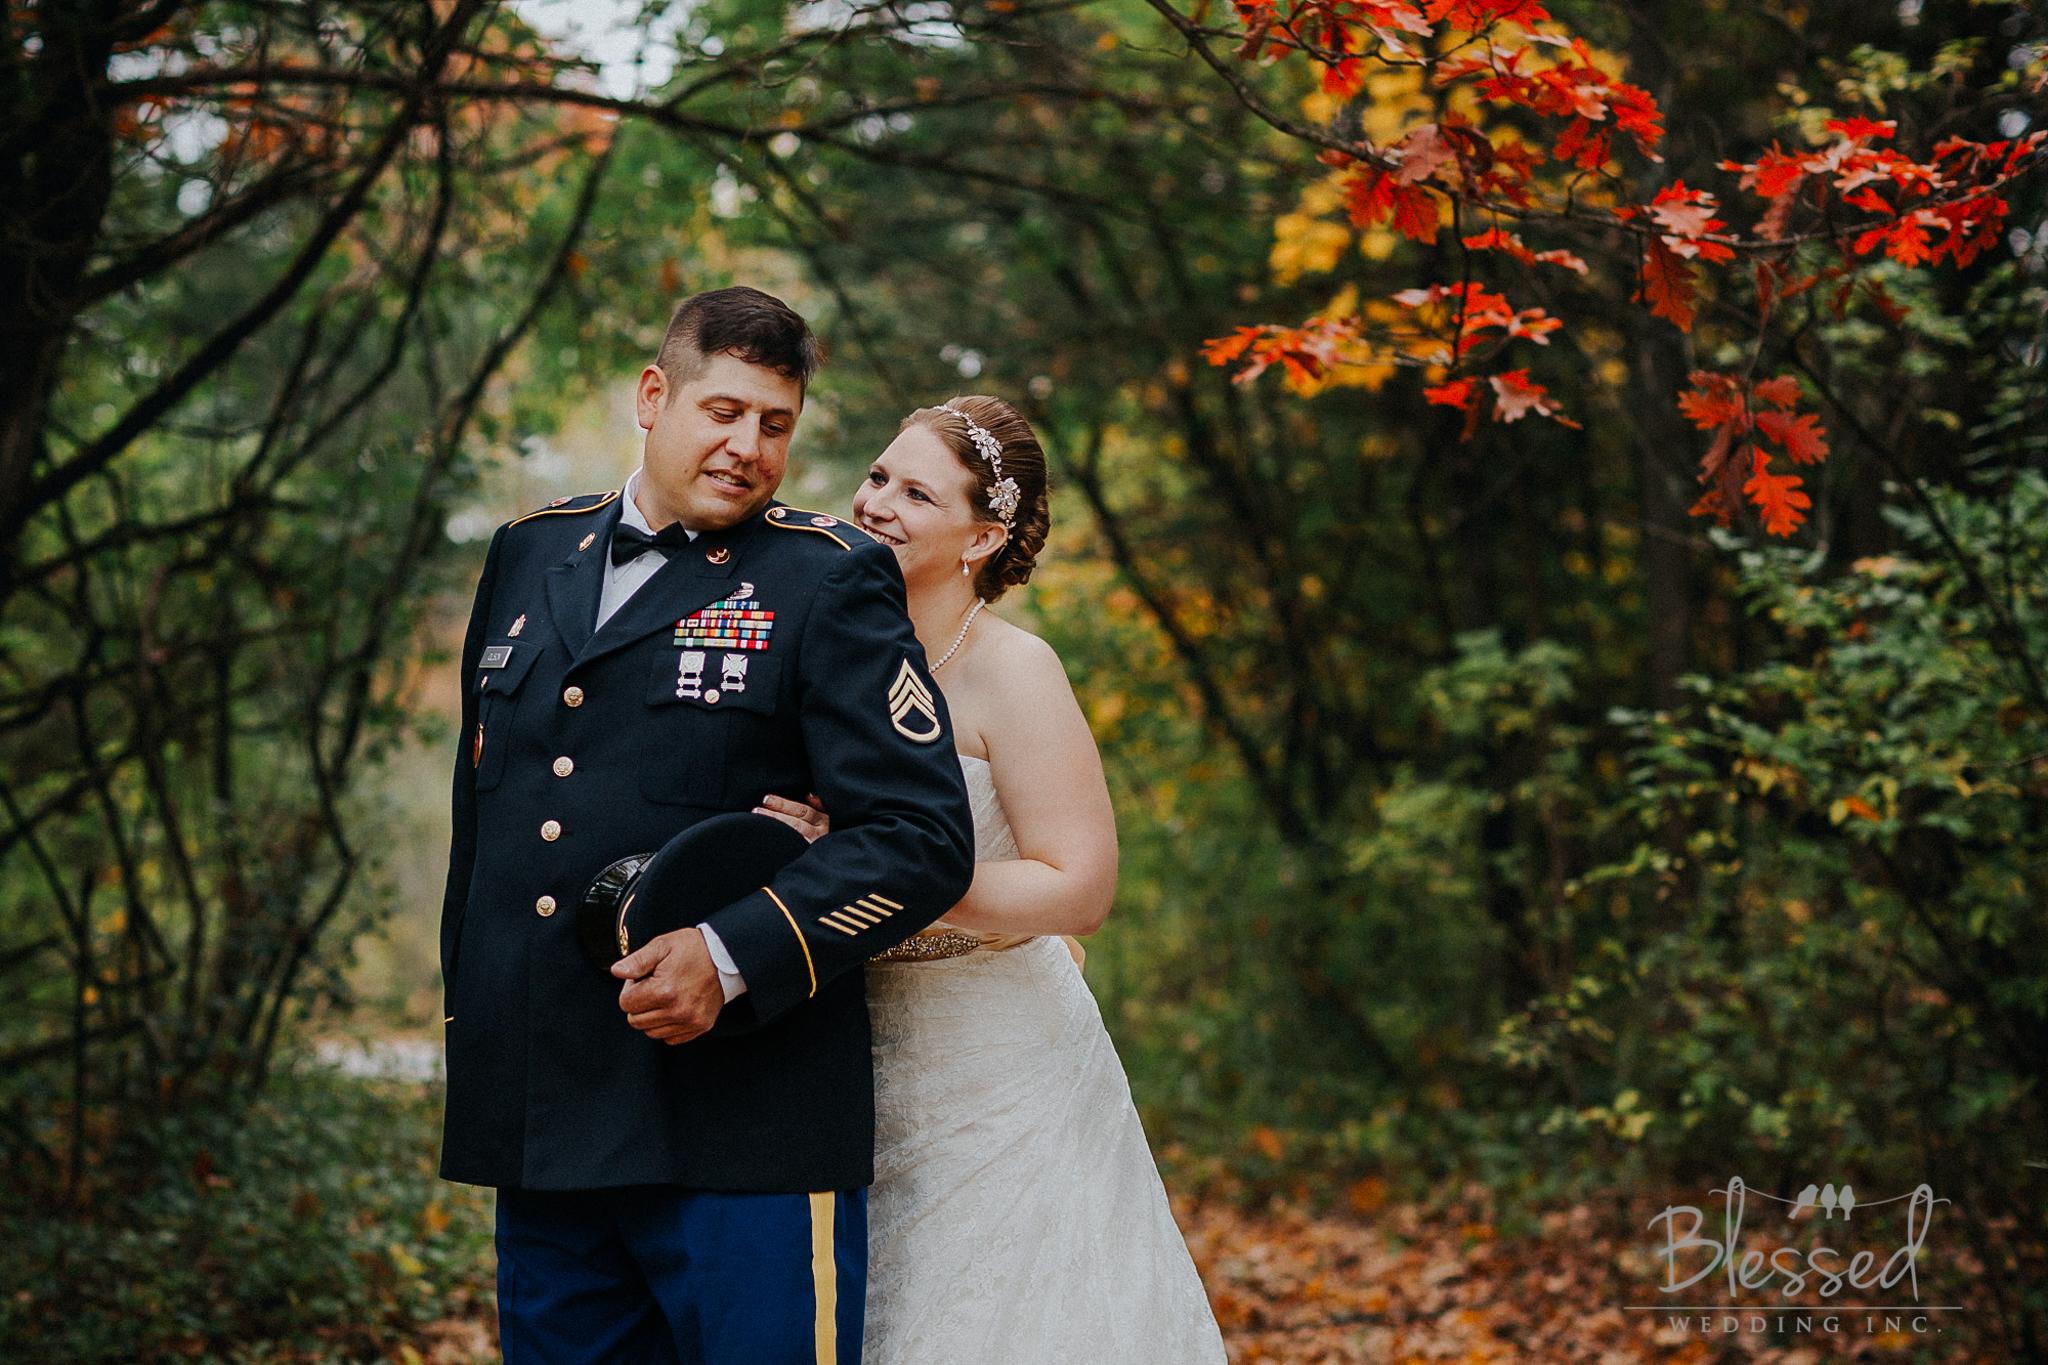 Destination Wedding Photography Minnesota By Blessed Wedding Photographers-20.jpg